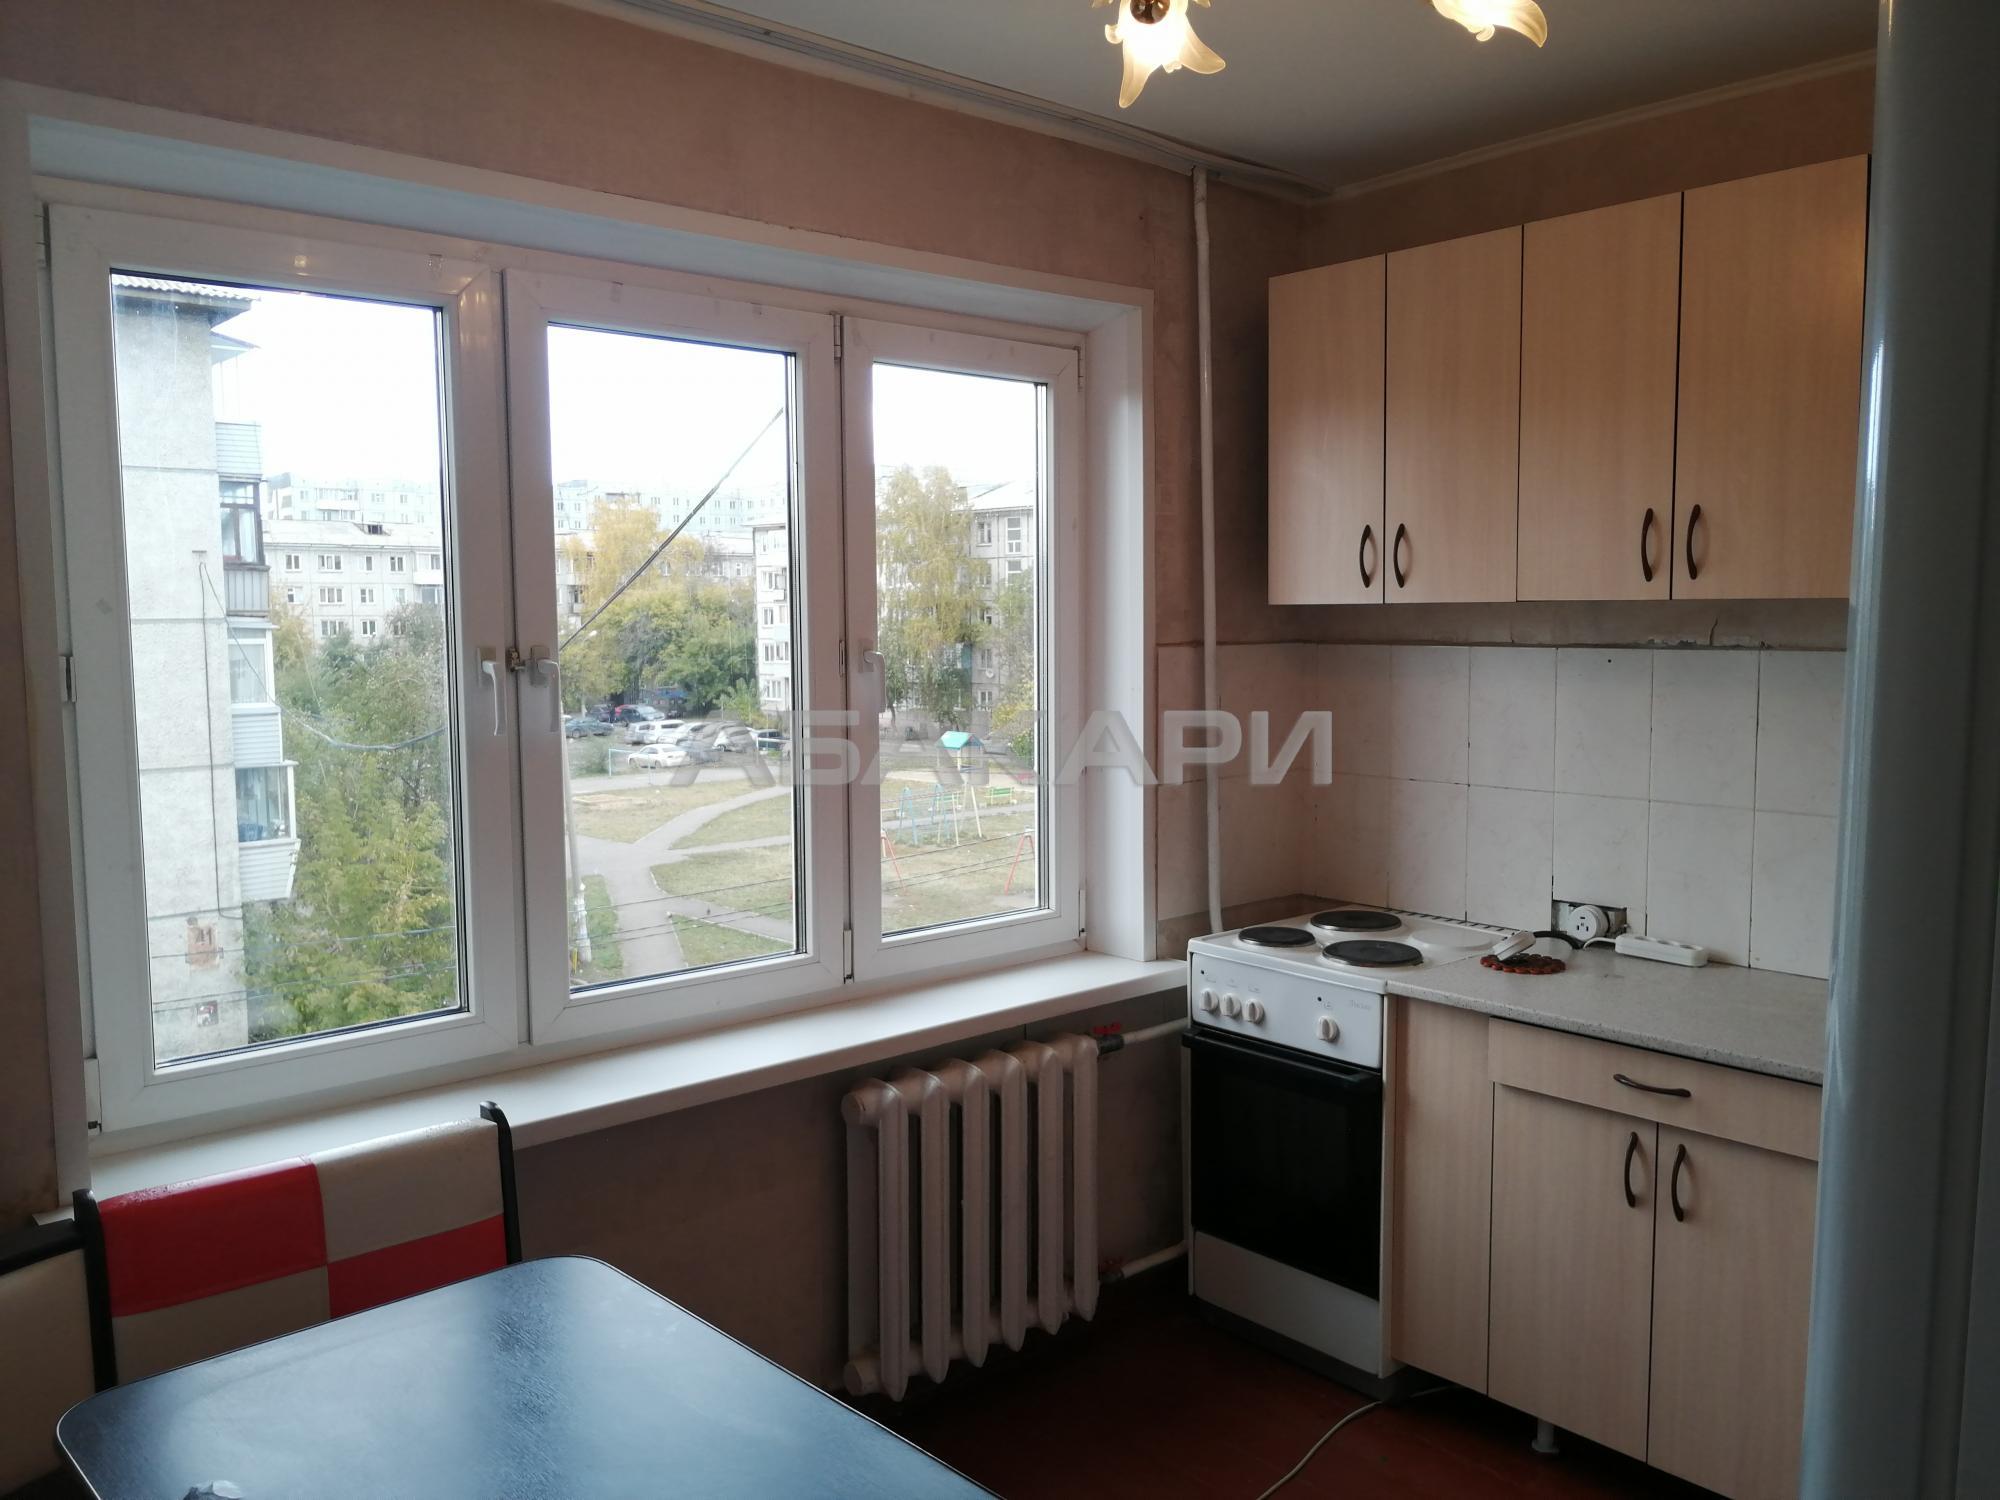 2к квартира Волжская улица, 5г 3/5 - 45кв | 13000 | аренда в Красноярске фото 6